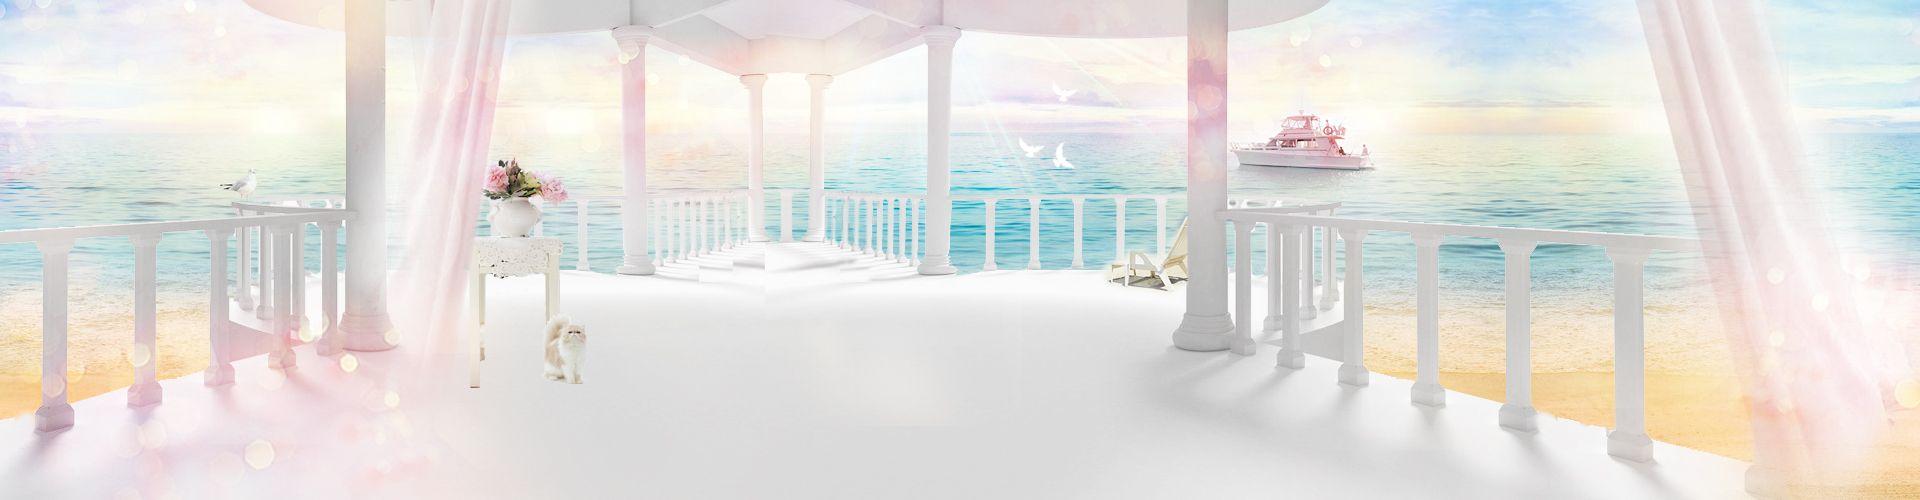 Romantic Wedding Background Banner In 2019 Wedding